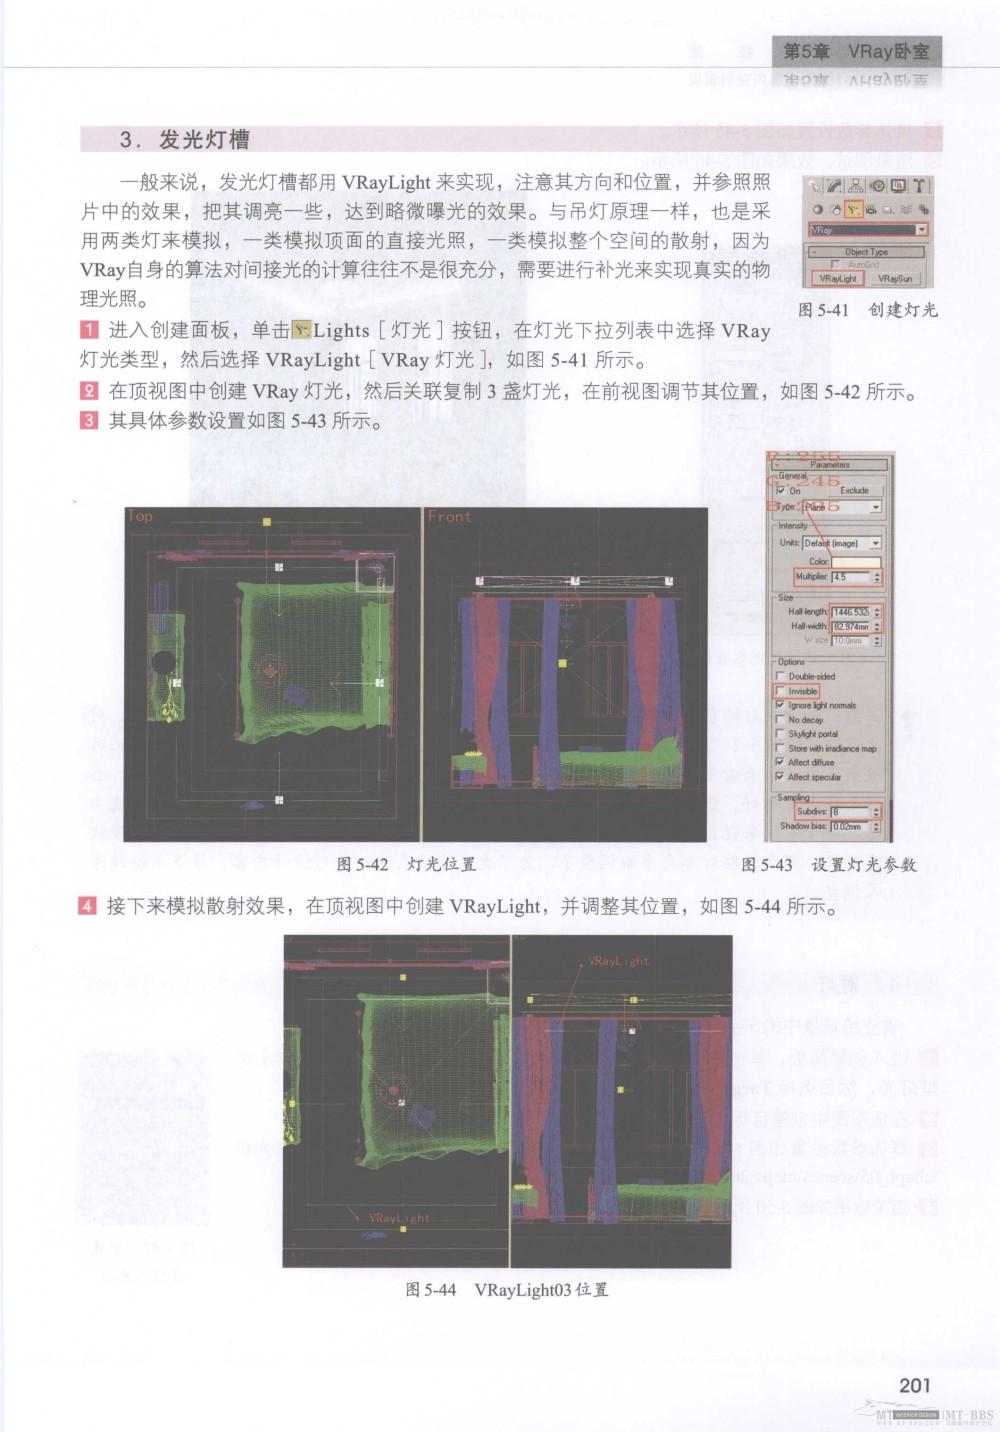 水晶石技法-3ds_Max&VRay室内空间表现_水晶石技法-3ds_Max&VRay室内空间表现_页面_207.jpg